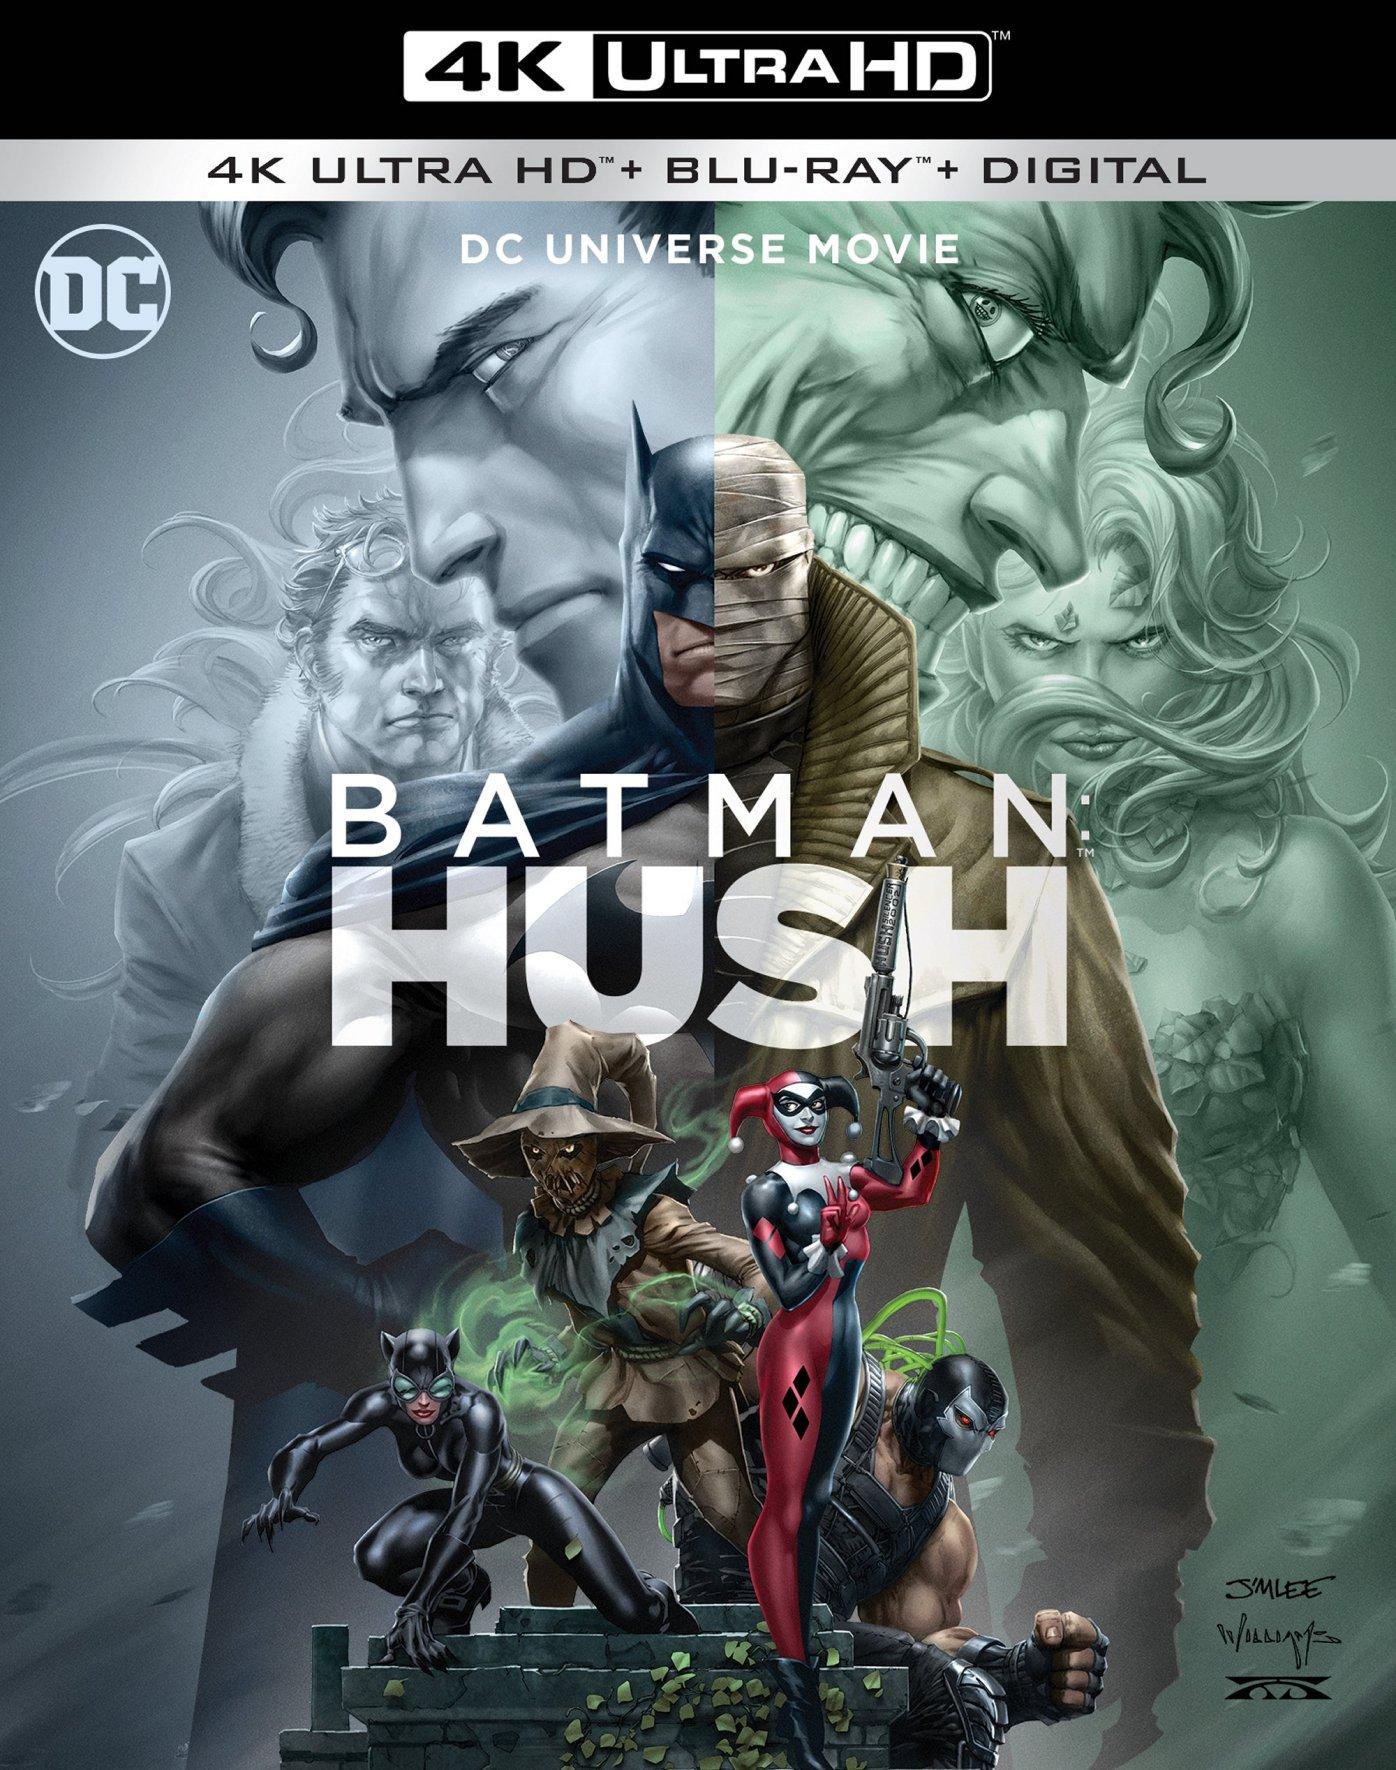 BATMAN HUSH 4K 2D